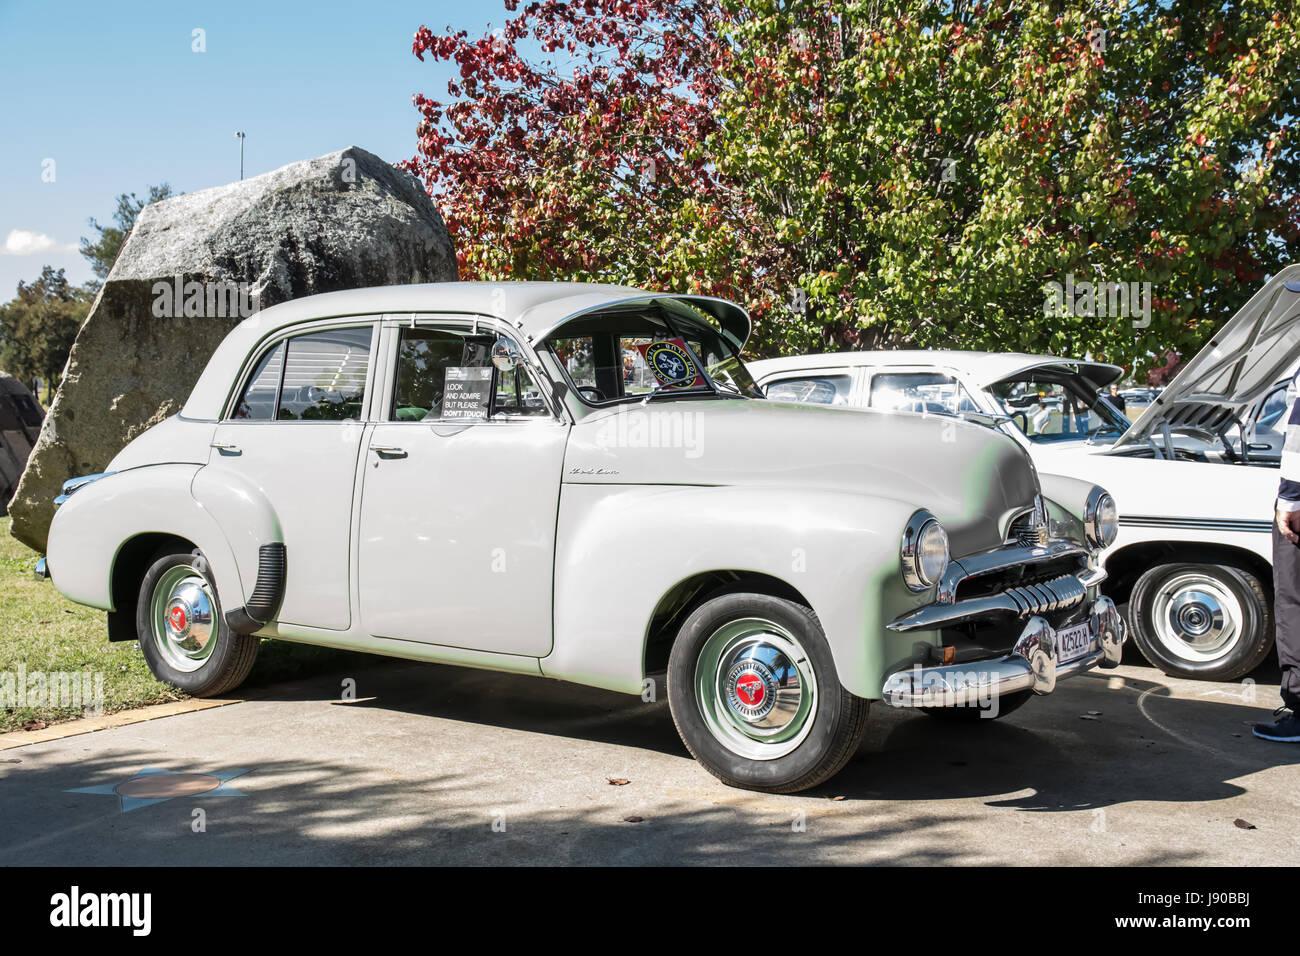 1953 Australian General Motors-Holden Model FJ Sedan on display at Tamworth NSW Australia May 2017. - Stock Image